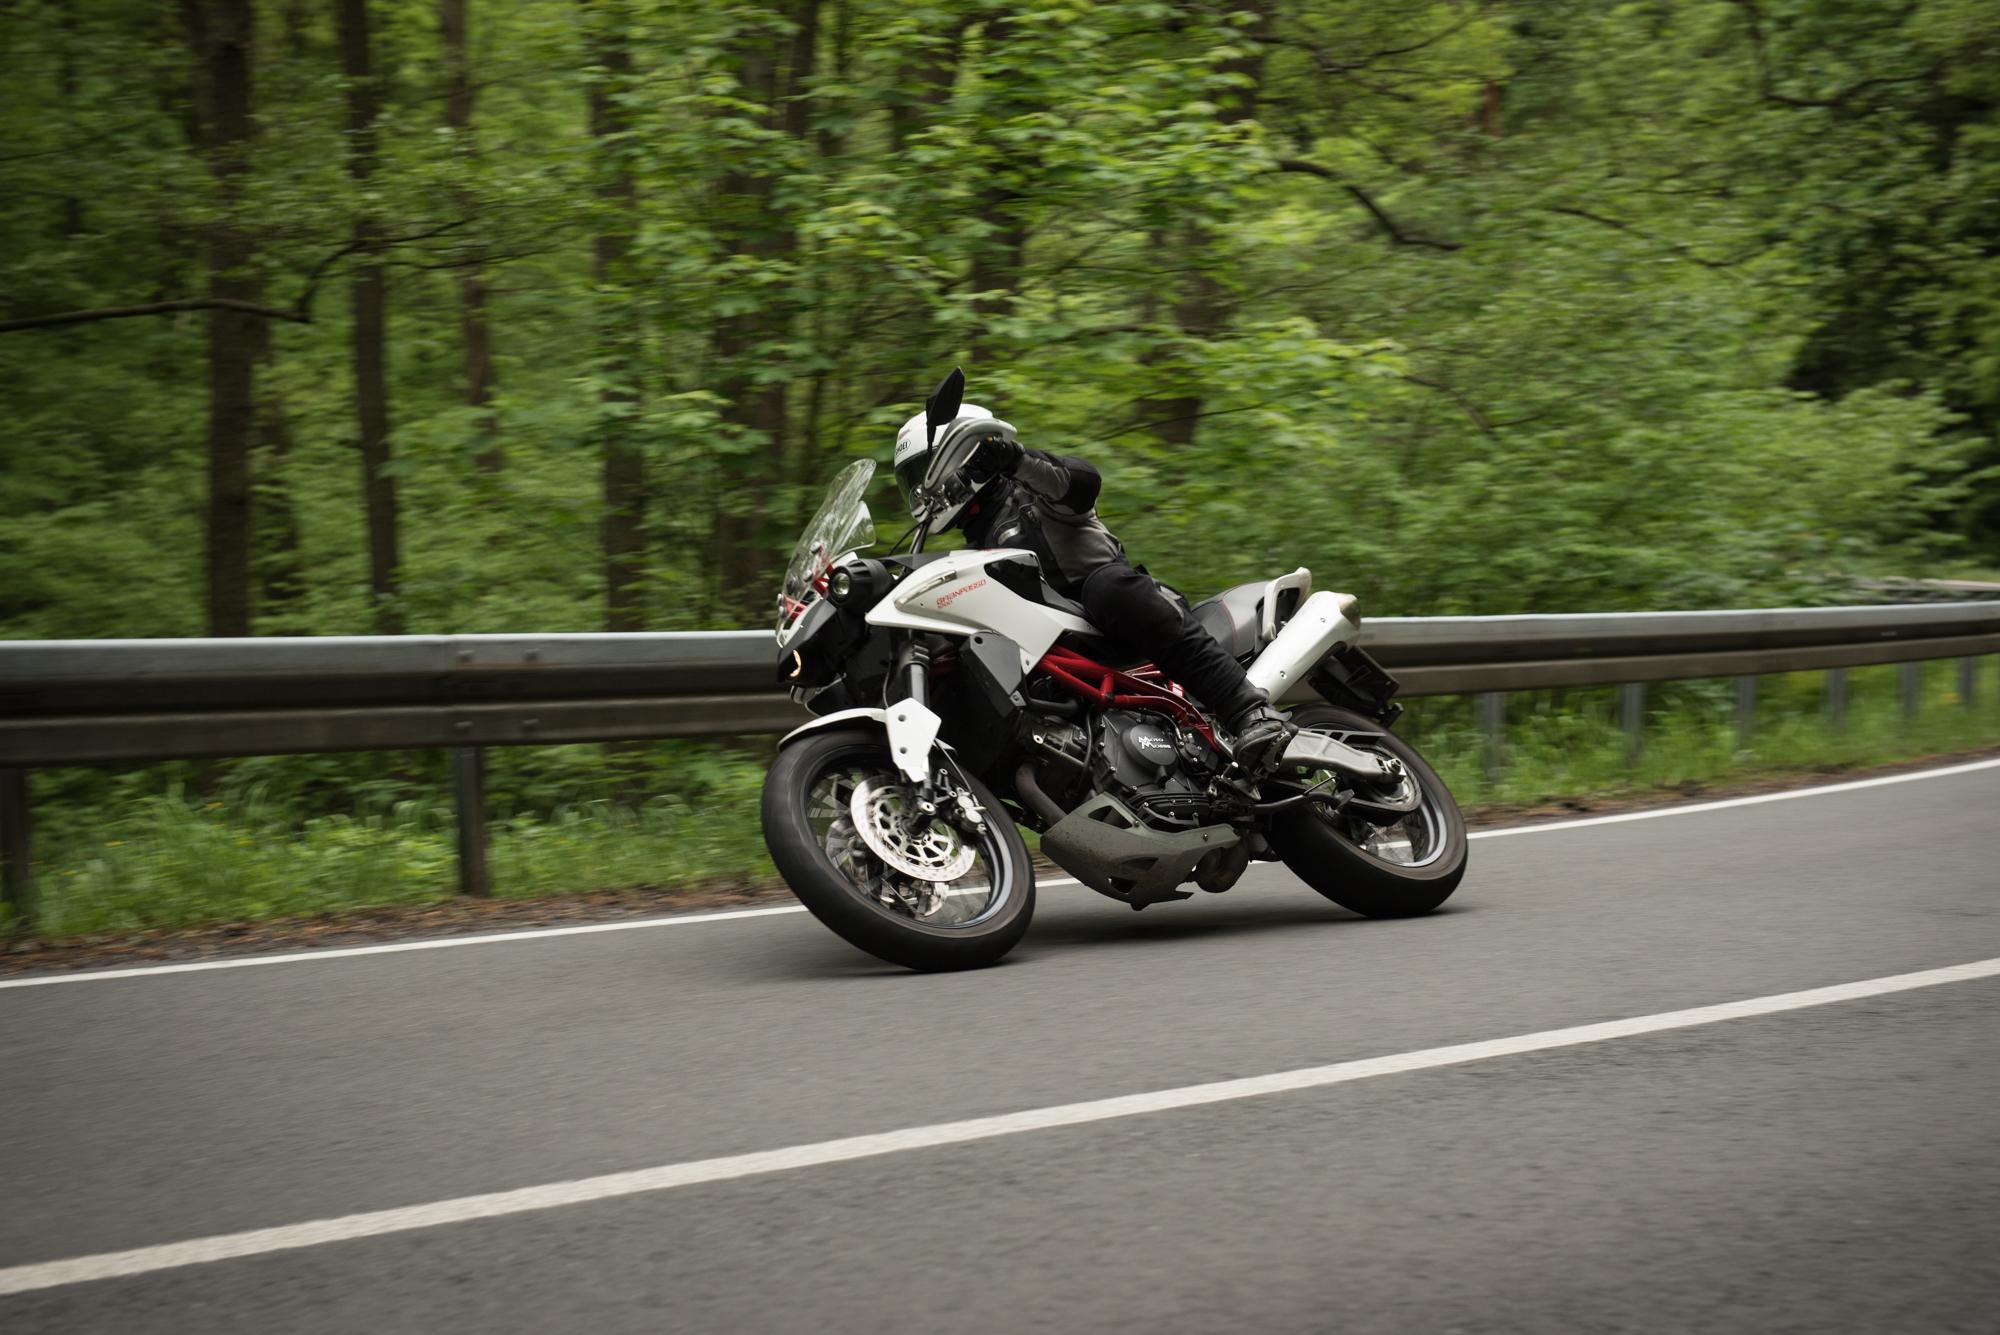 Hitting some curves (Moto Morini Granpasso)